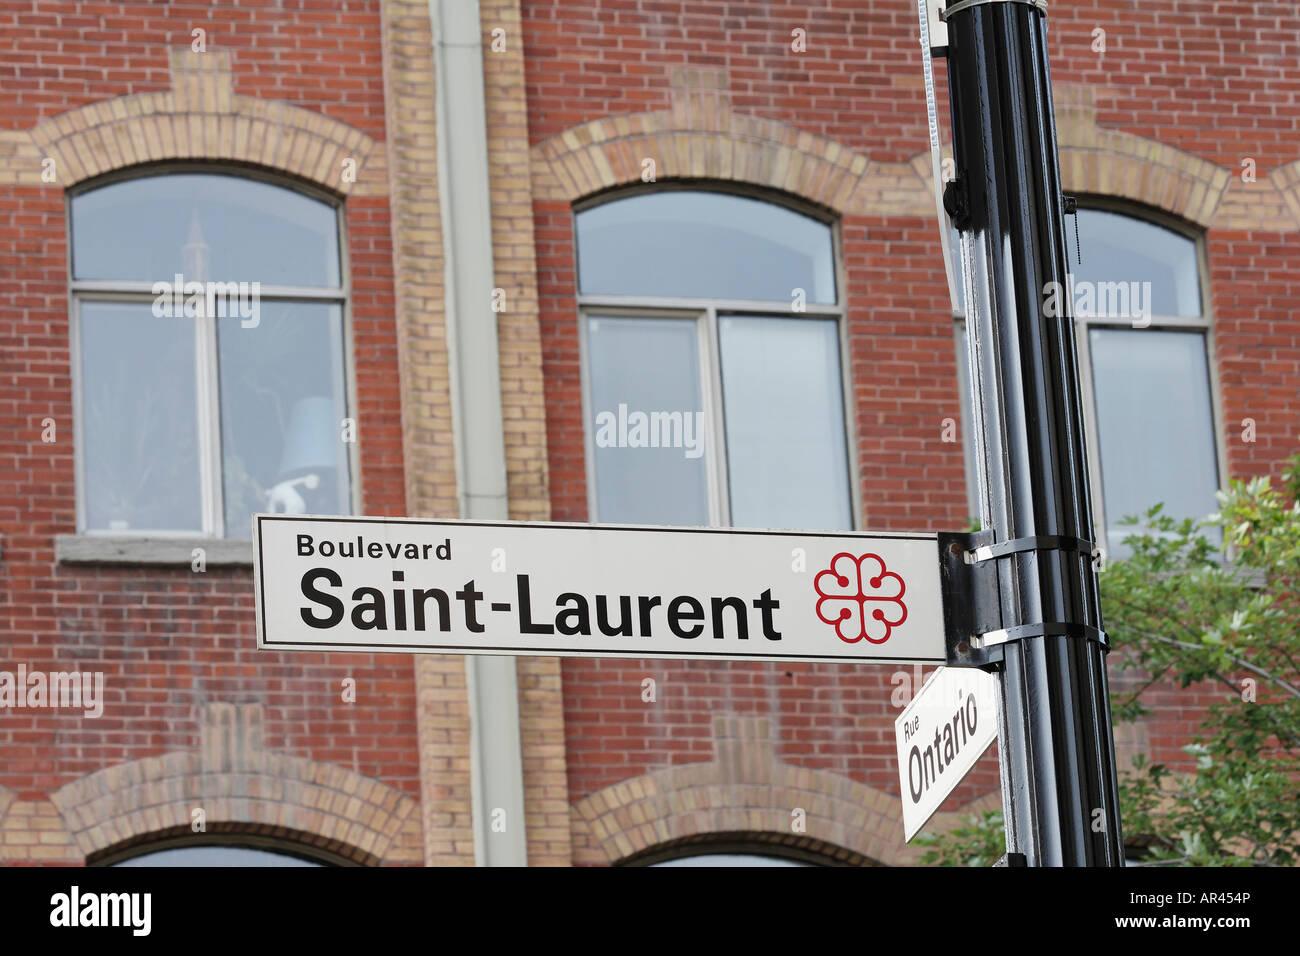 Street sign of Boulevard Saint Laurent Montreal Montreal Quebec Canada - Stock Image